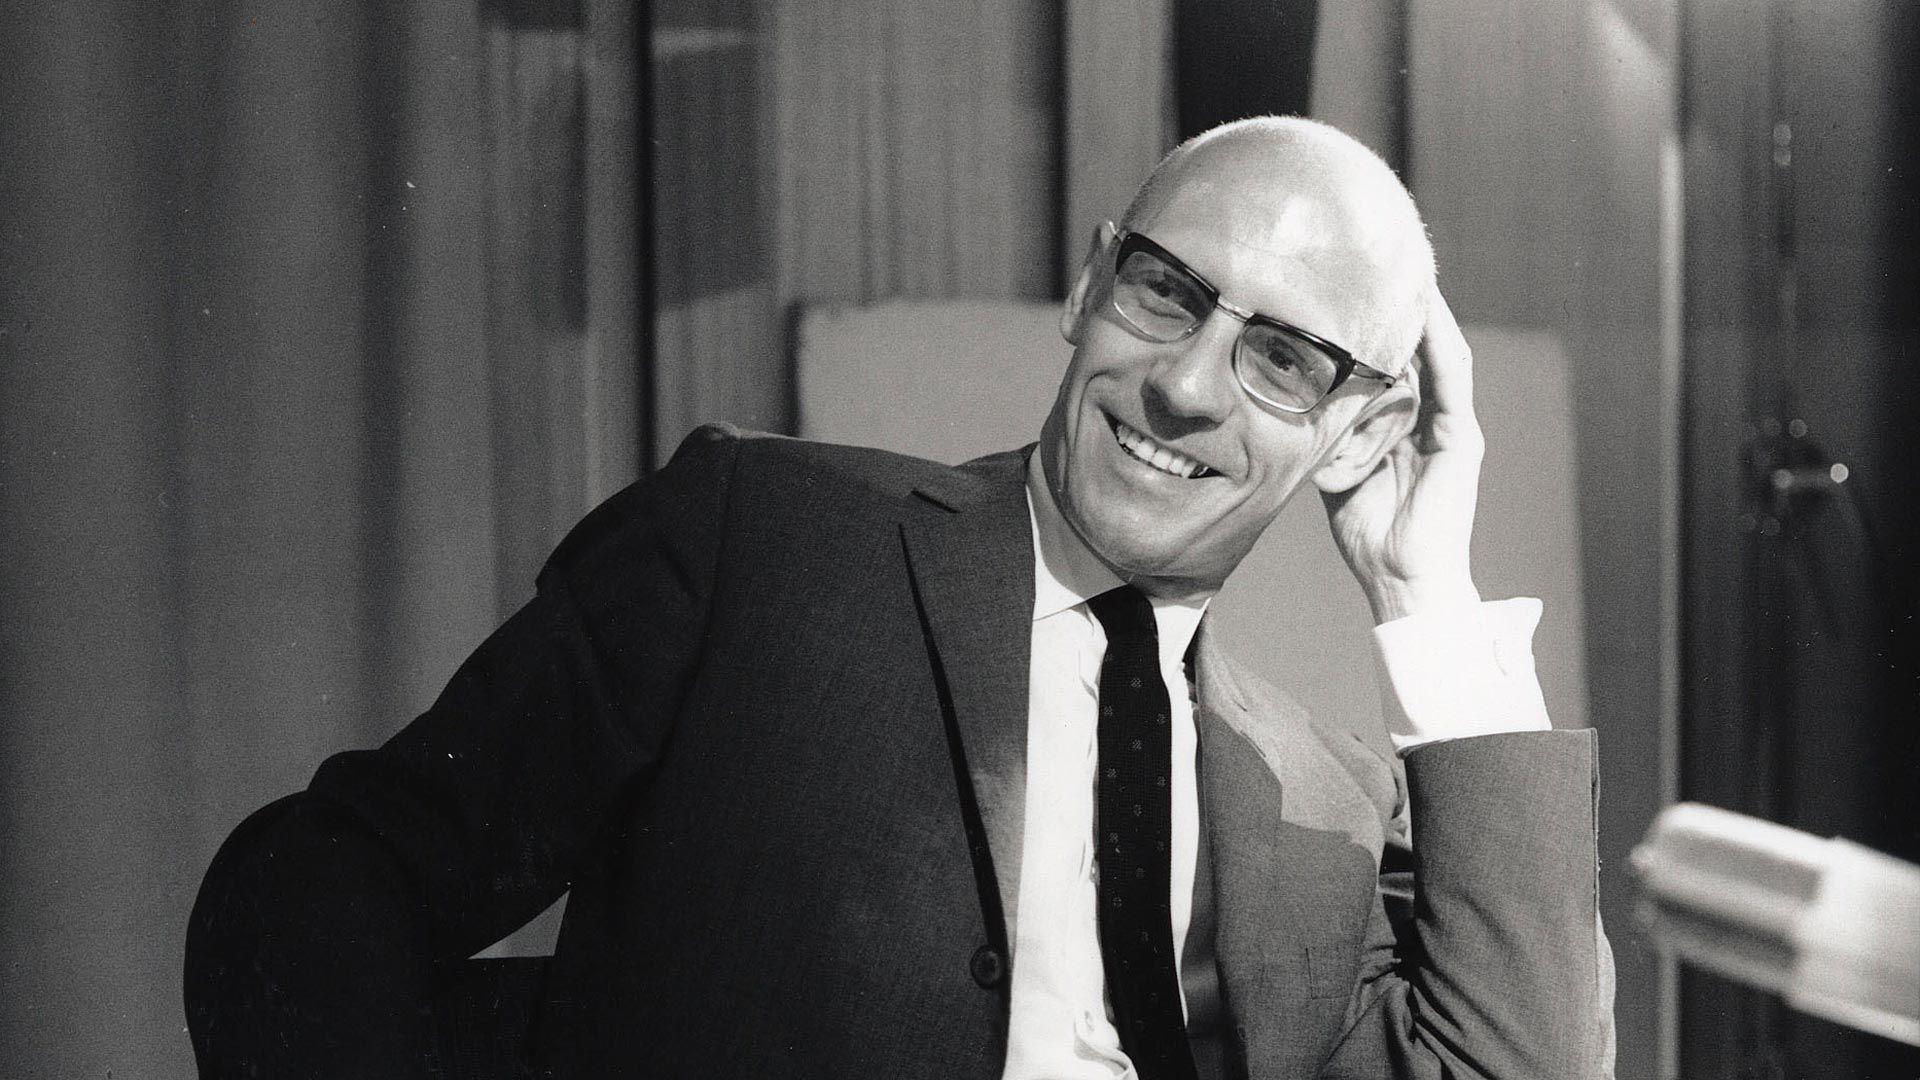 https://fbonline-blog-production.s3.sa-east-1.amazonaws.com/Michel_Foucault_bb9bb941eb.jpg